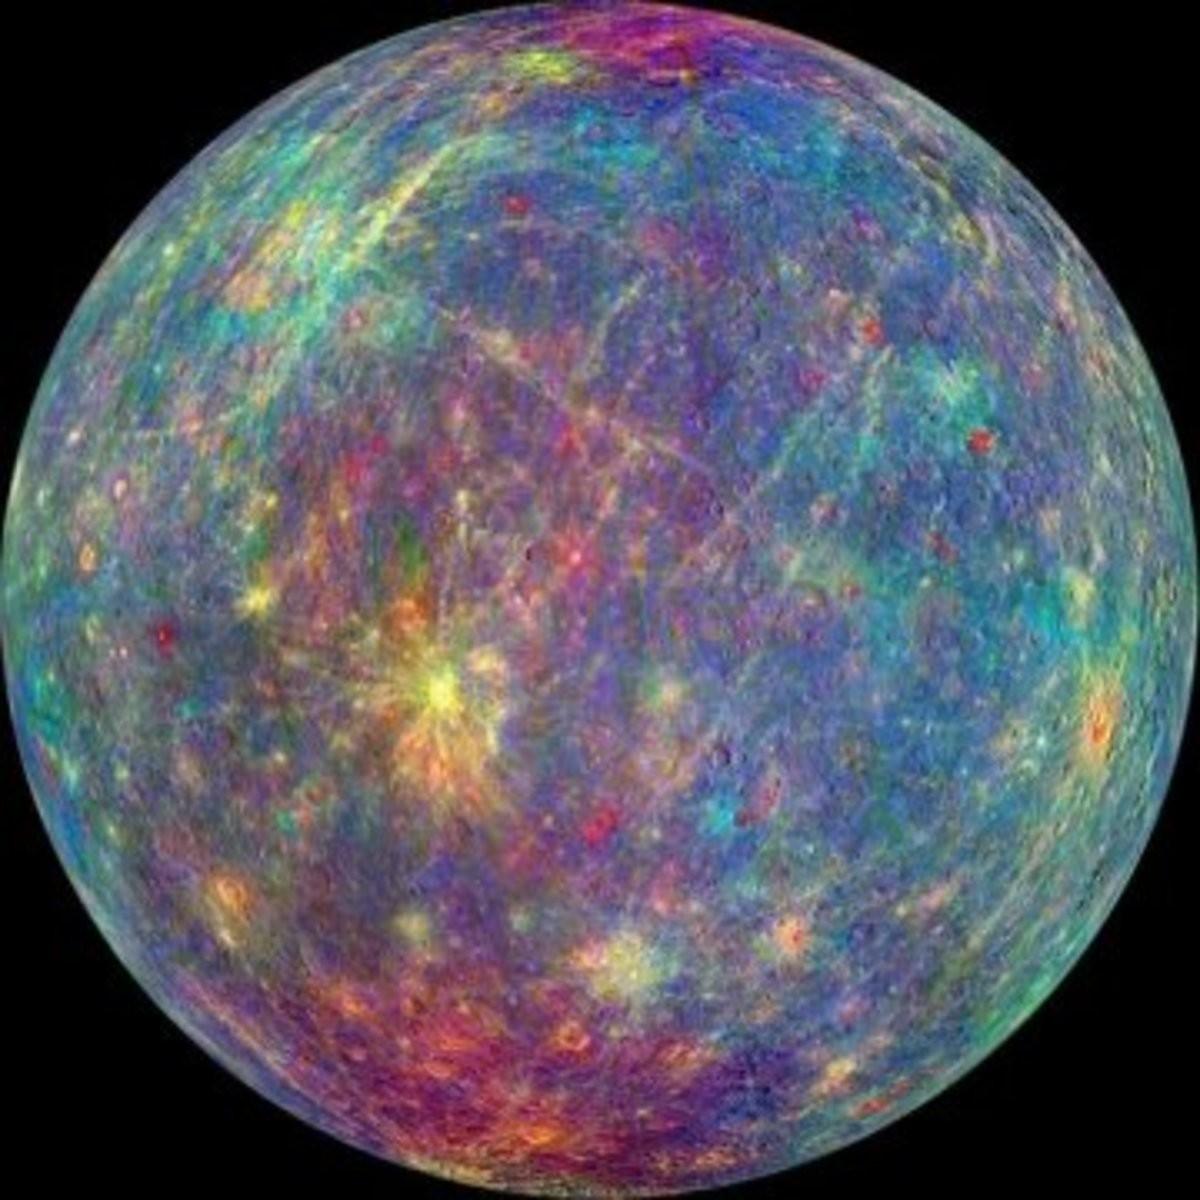 Mercury, masculinity treatment, big load. Mercury's thin, dense crust Space ------ 28th Apr, 2018 Mercury is small, fast and close to the sun, makin